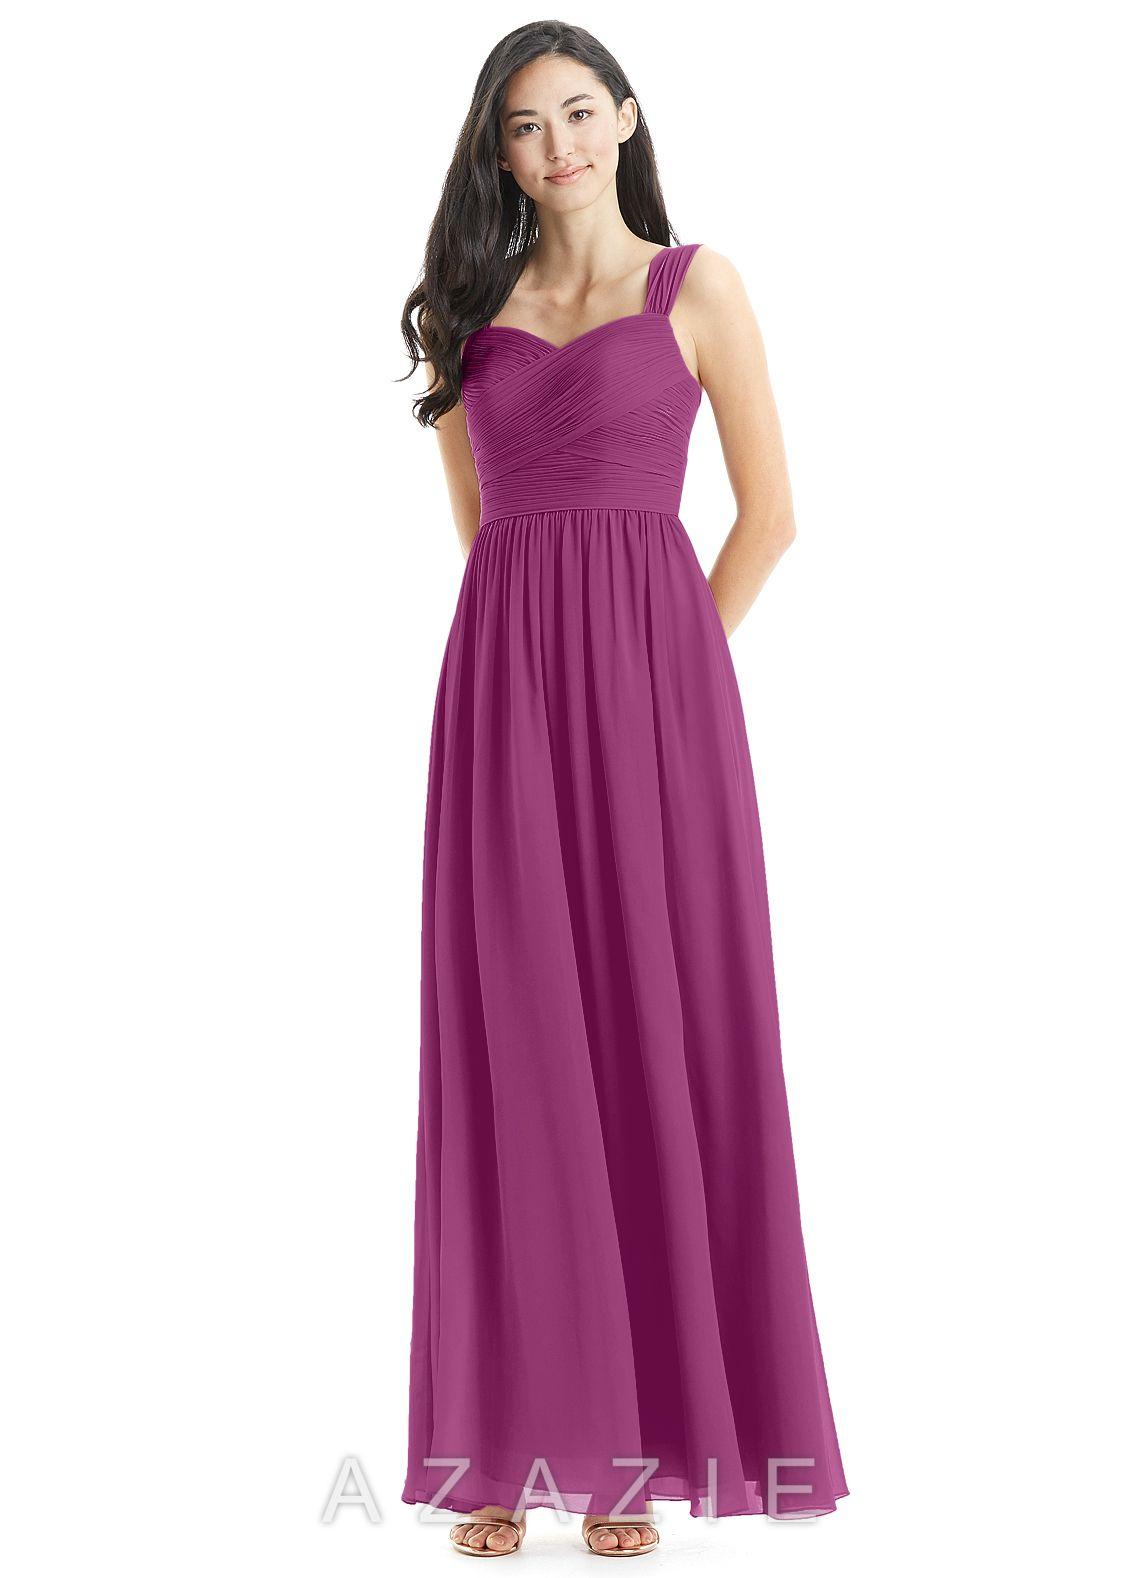 90a33fce9a6 Azazie Zapheira Bridesmaid Dress - Orchid